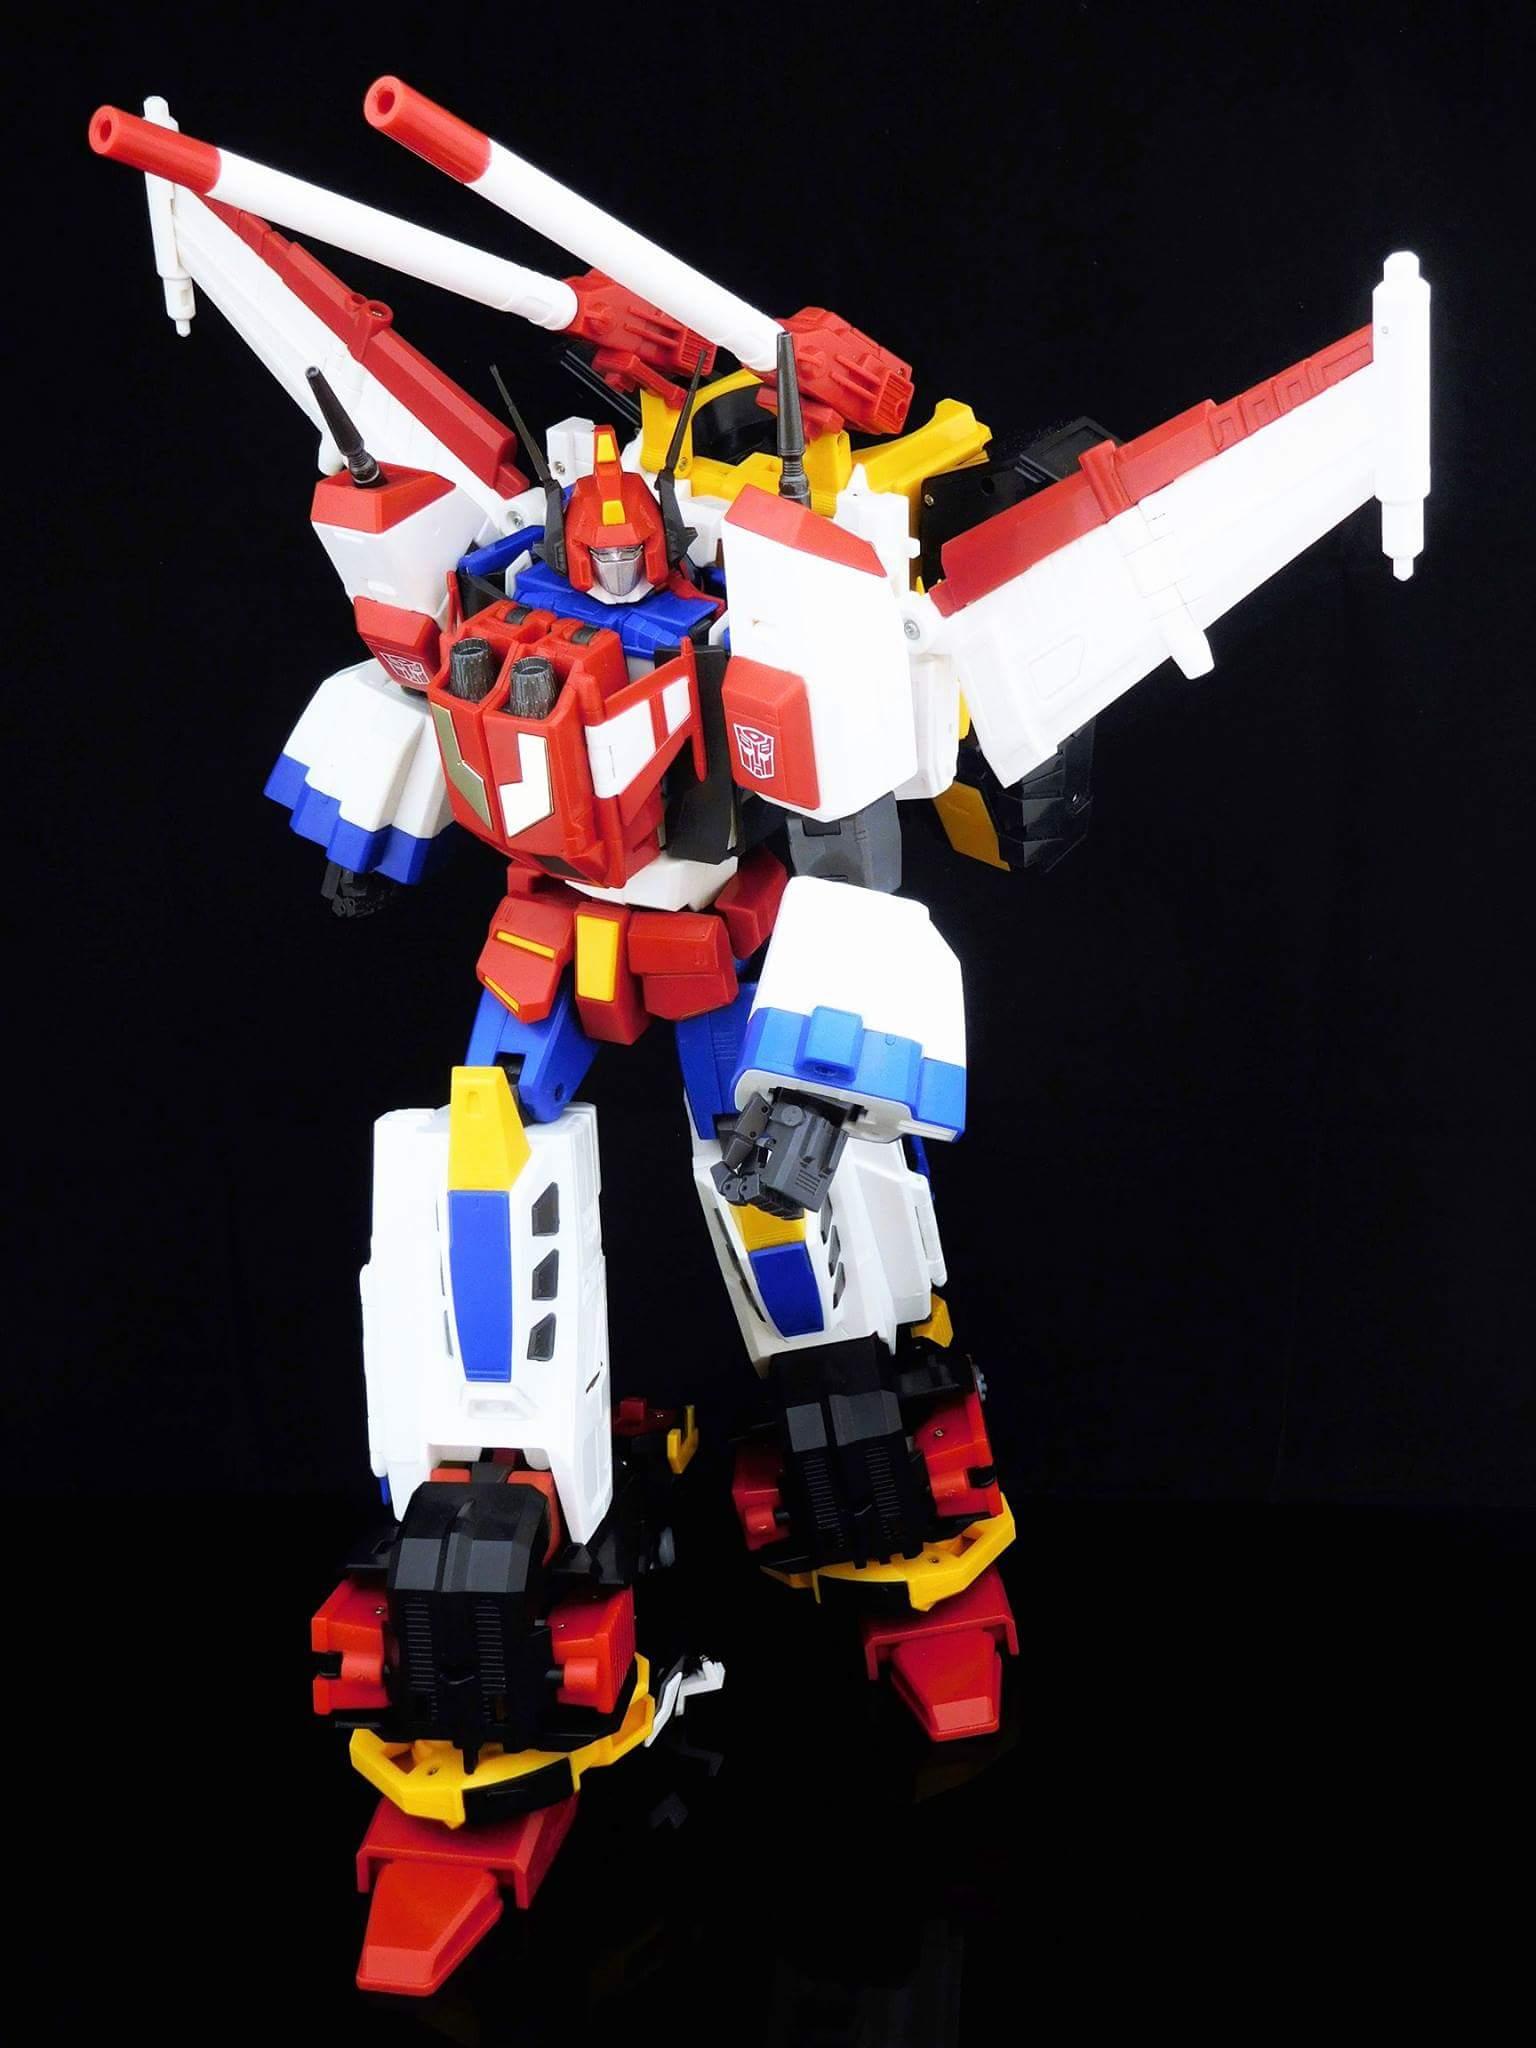 [KFC Toys] Produit Tiers - Jouet Phase 8-A Simba - aka Victory Leo (Transformers Victory) - Page 2 G5N1XQak